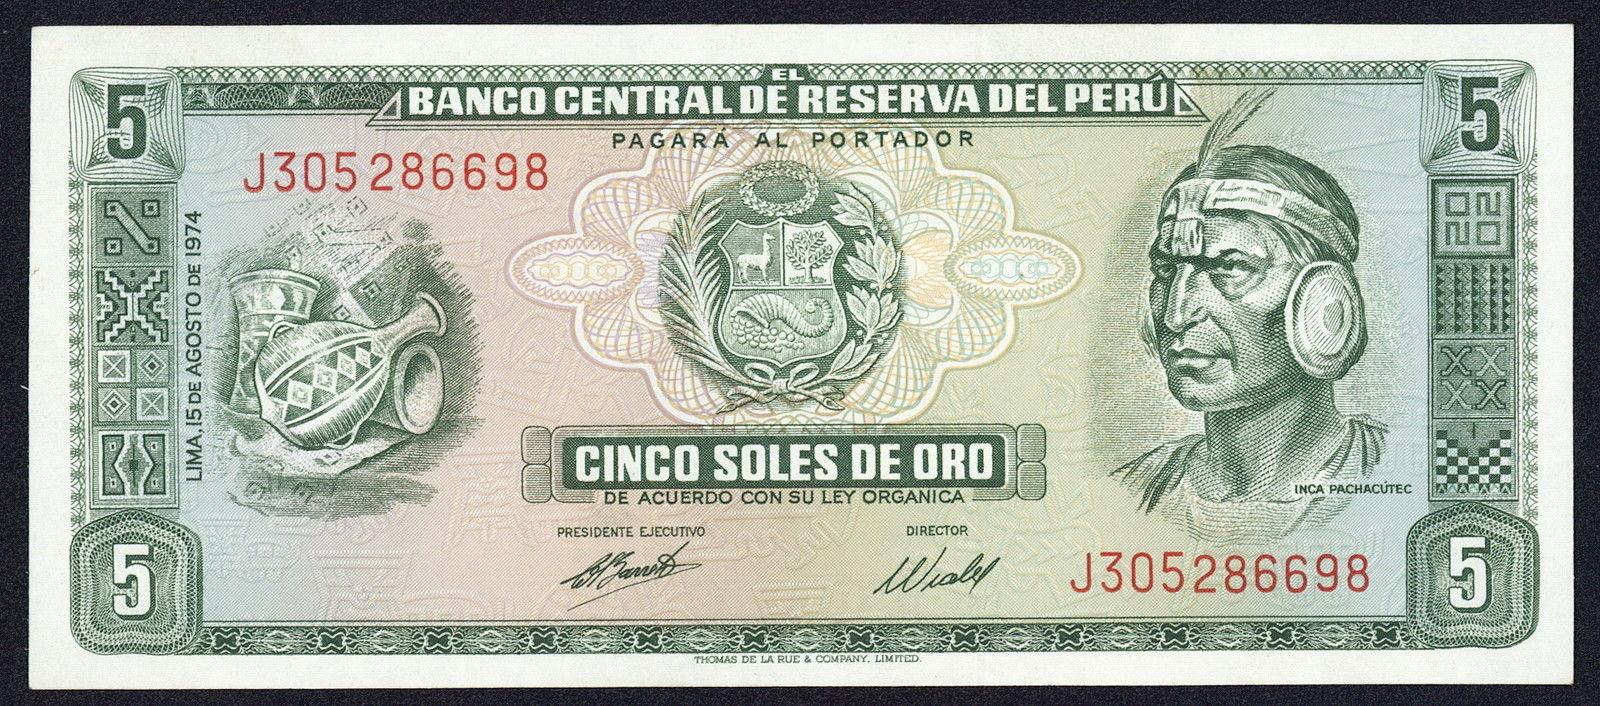 Banco de oro forex exchange